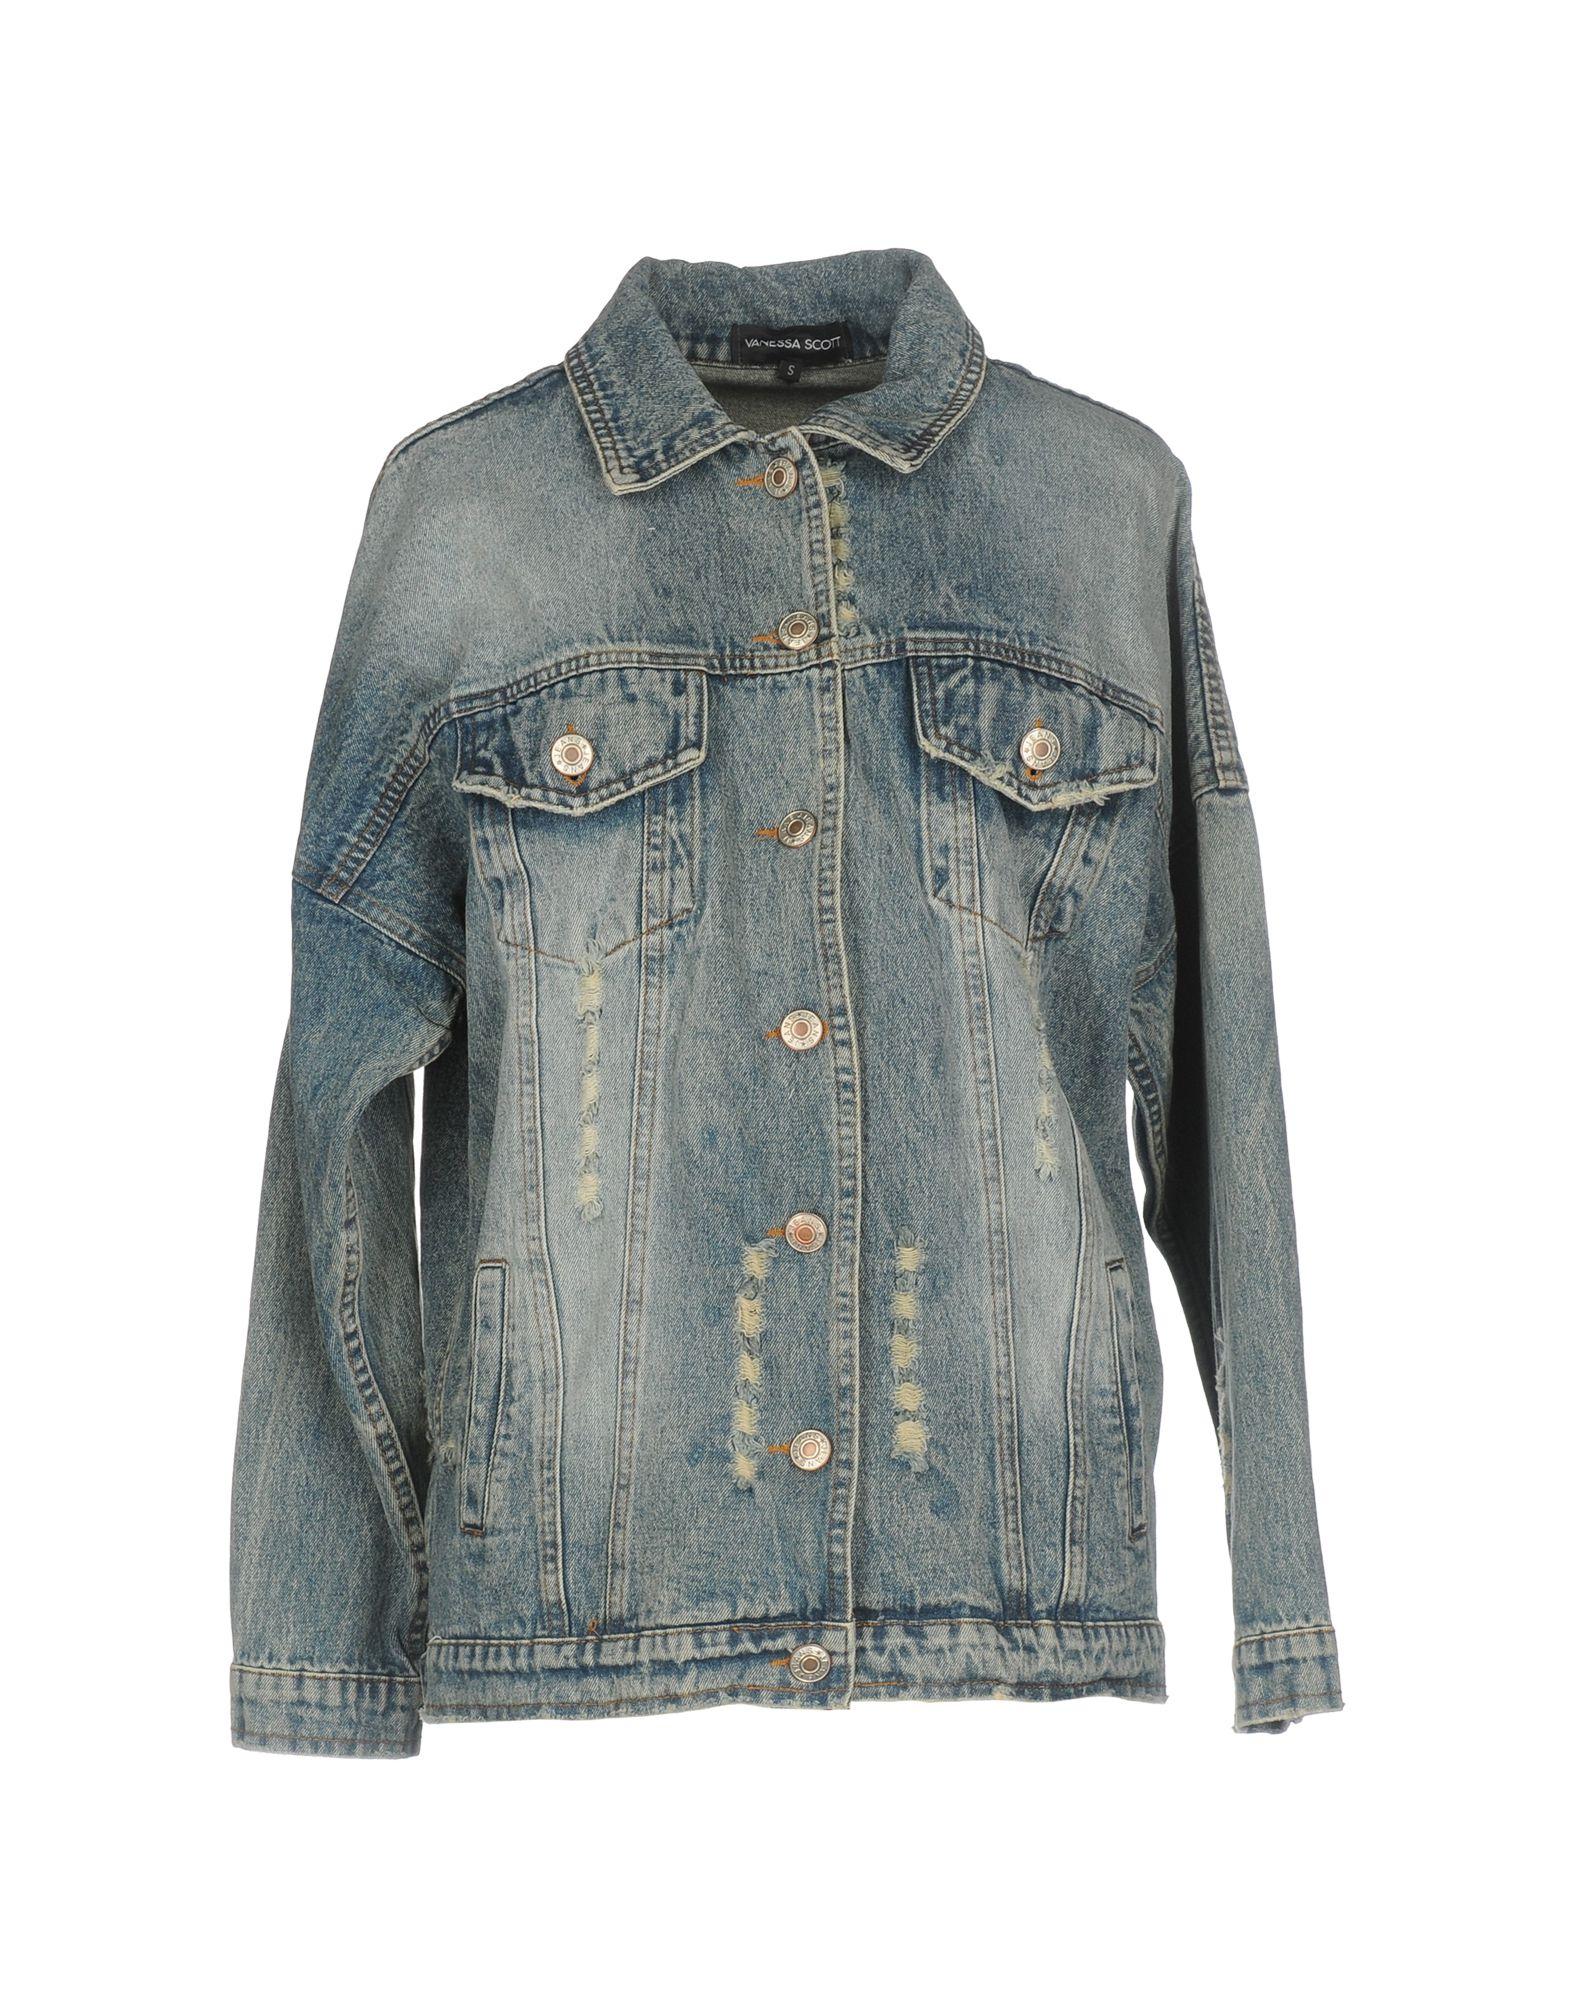 VANESSA SCOTT Джинсовая верхняя одежда represent джинсовая верхняя одежда